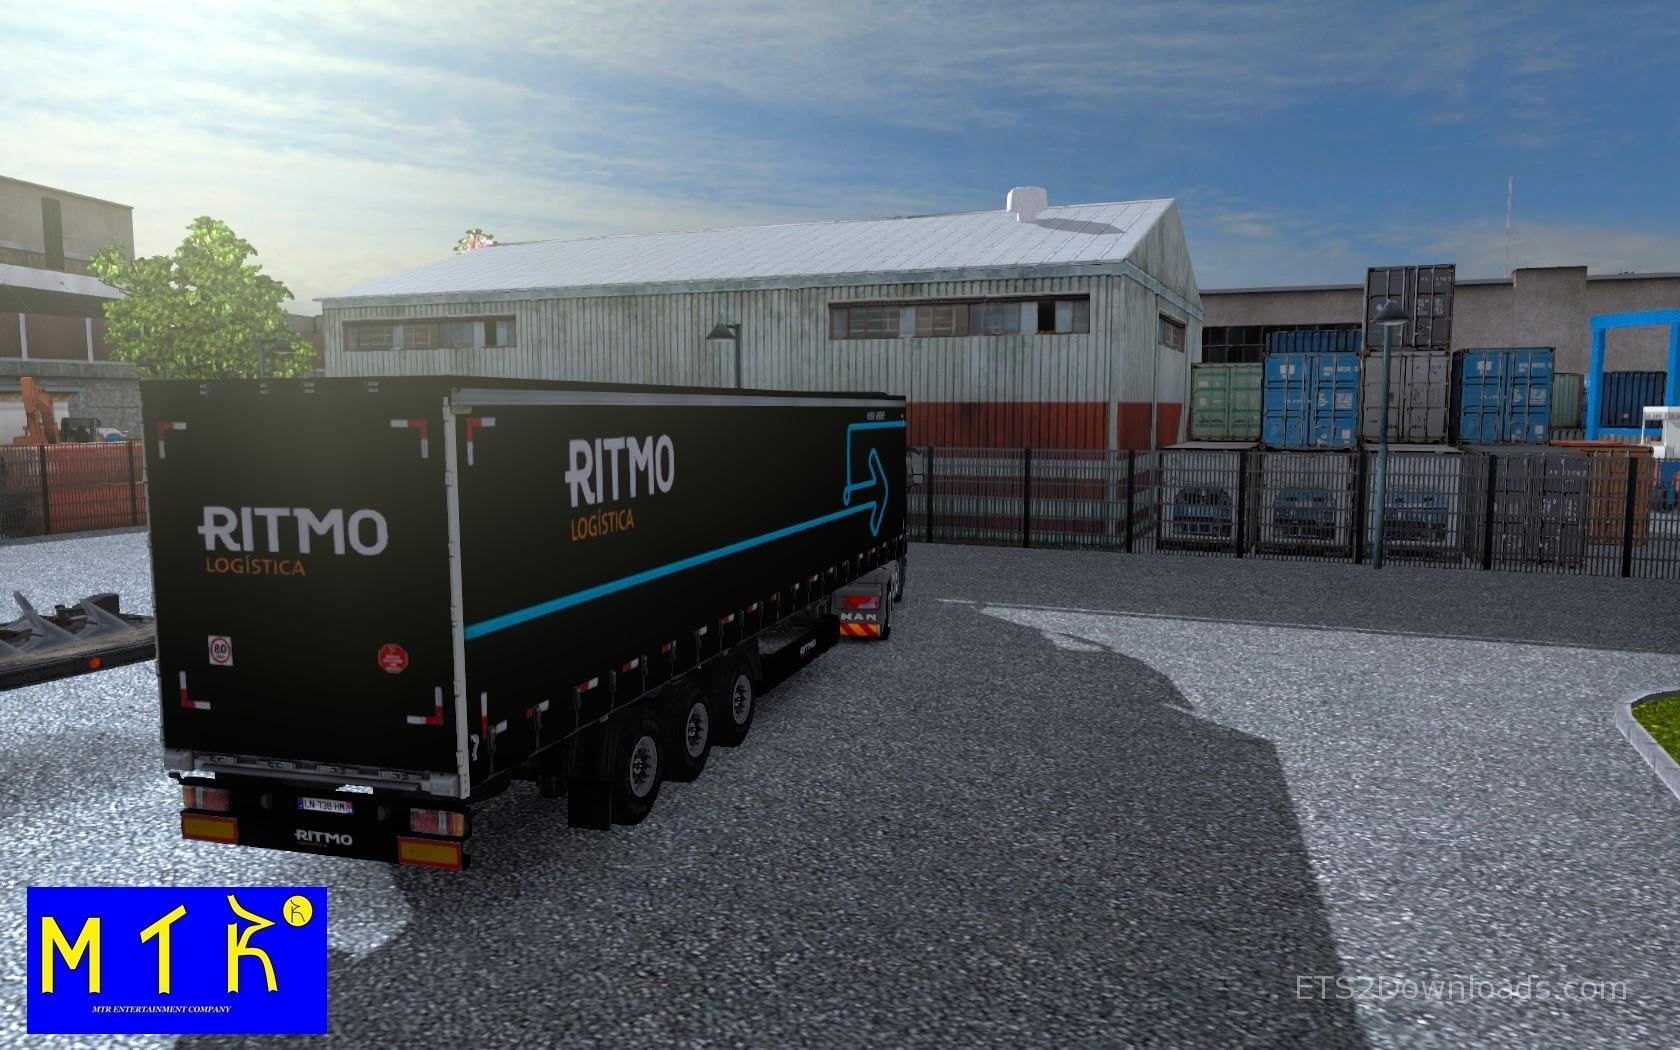 ritmo-logistica-trailer-1